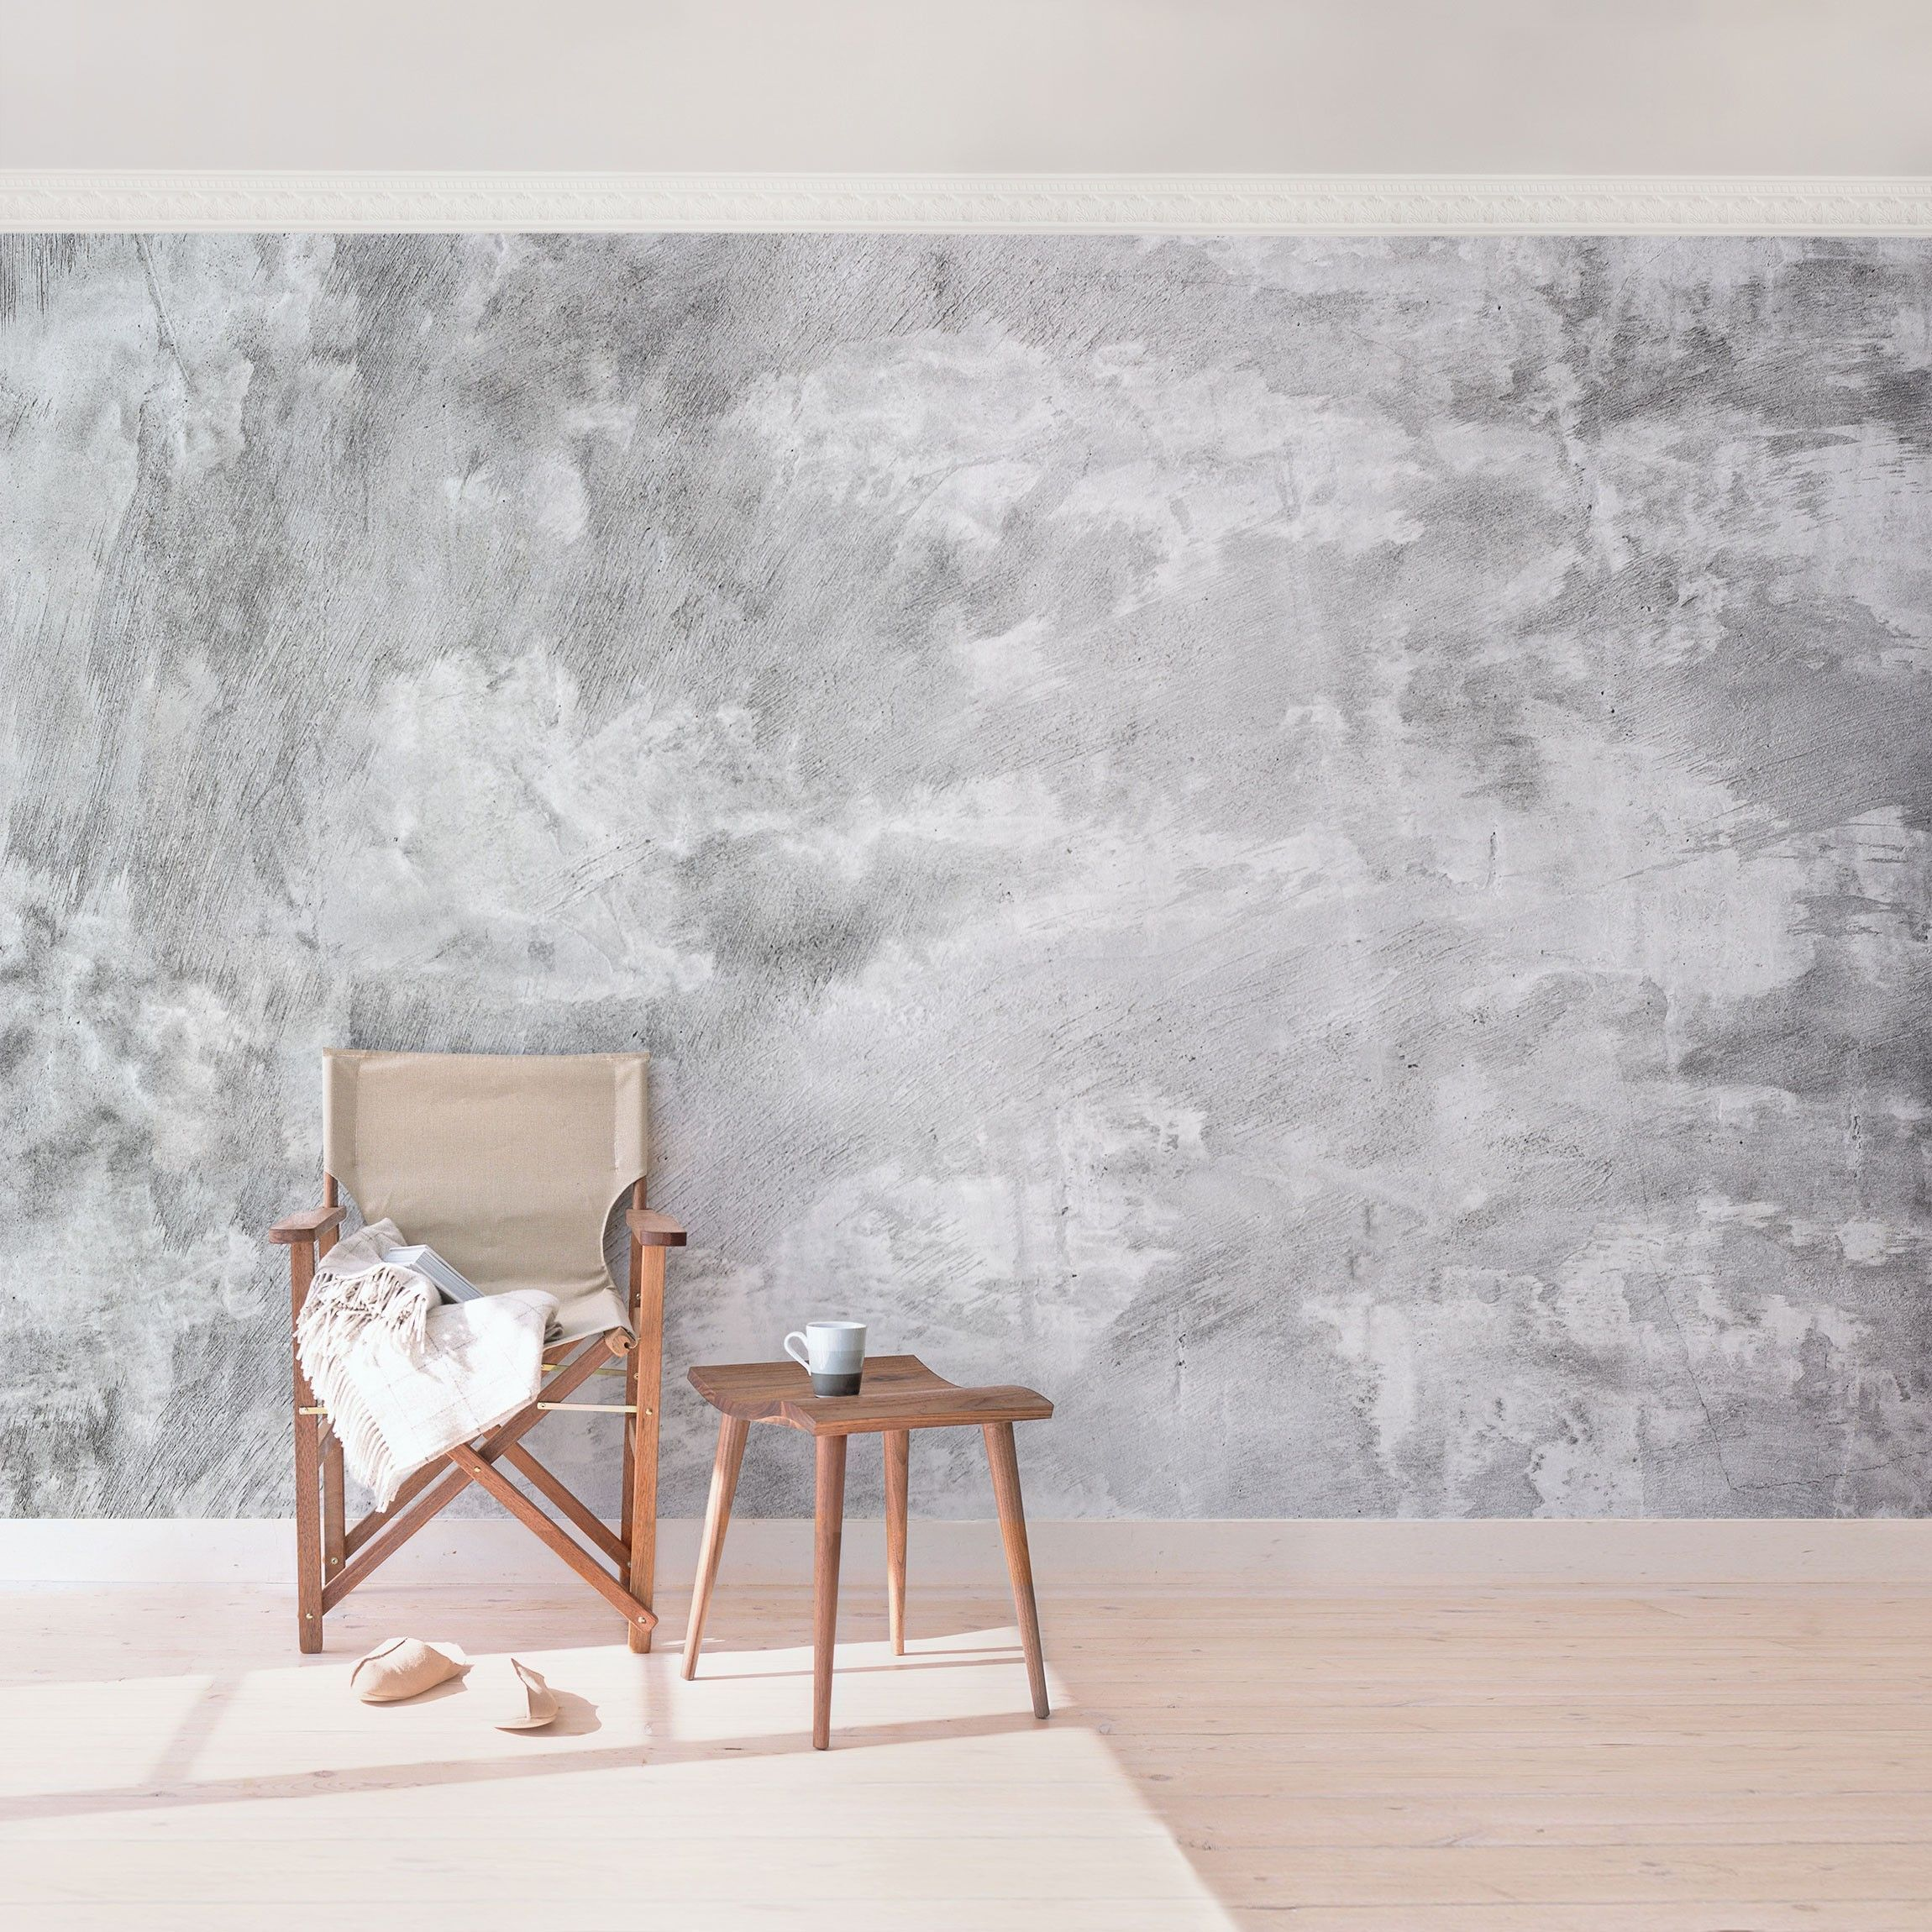 Betonwande Coolen Industrielook Mit Tapeten Wohnzimmerideenwandgestaltung Beton Wande Mit Tapeten Im Coo In 2020 Betontapete Tapeten Wohnzimmer Tapete Betonoptik